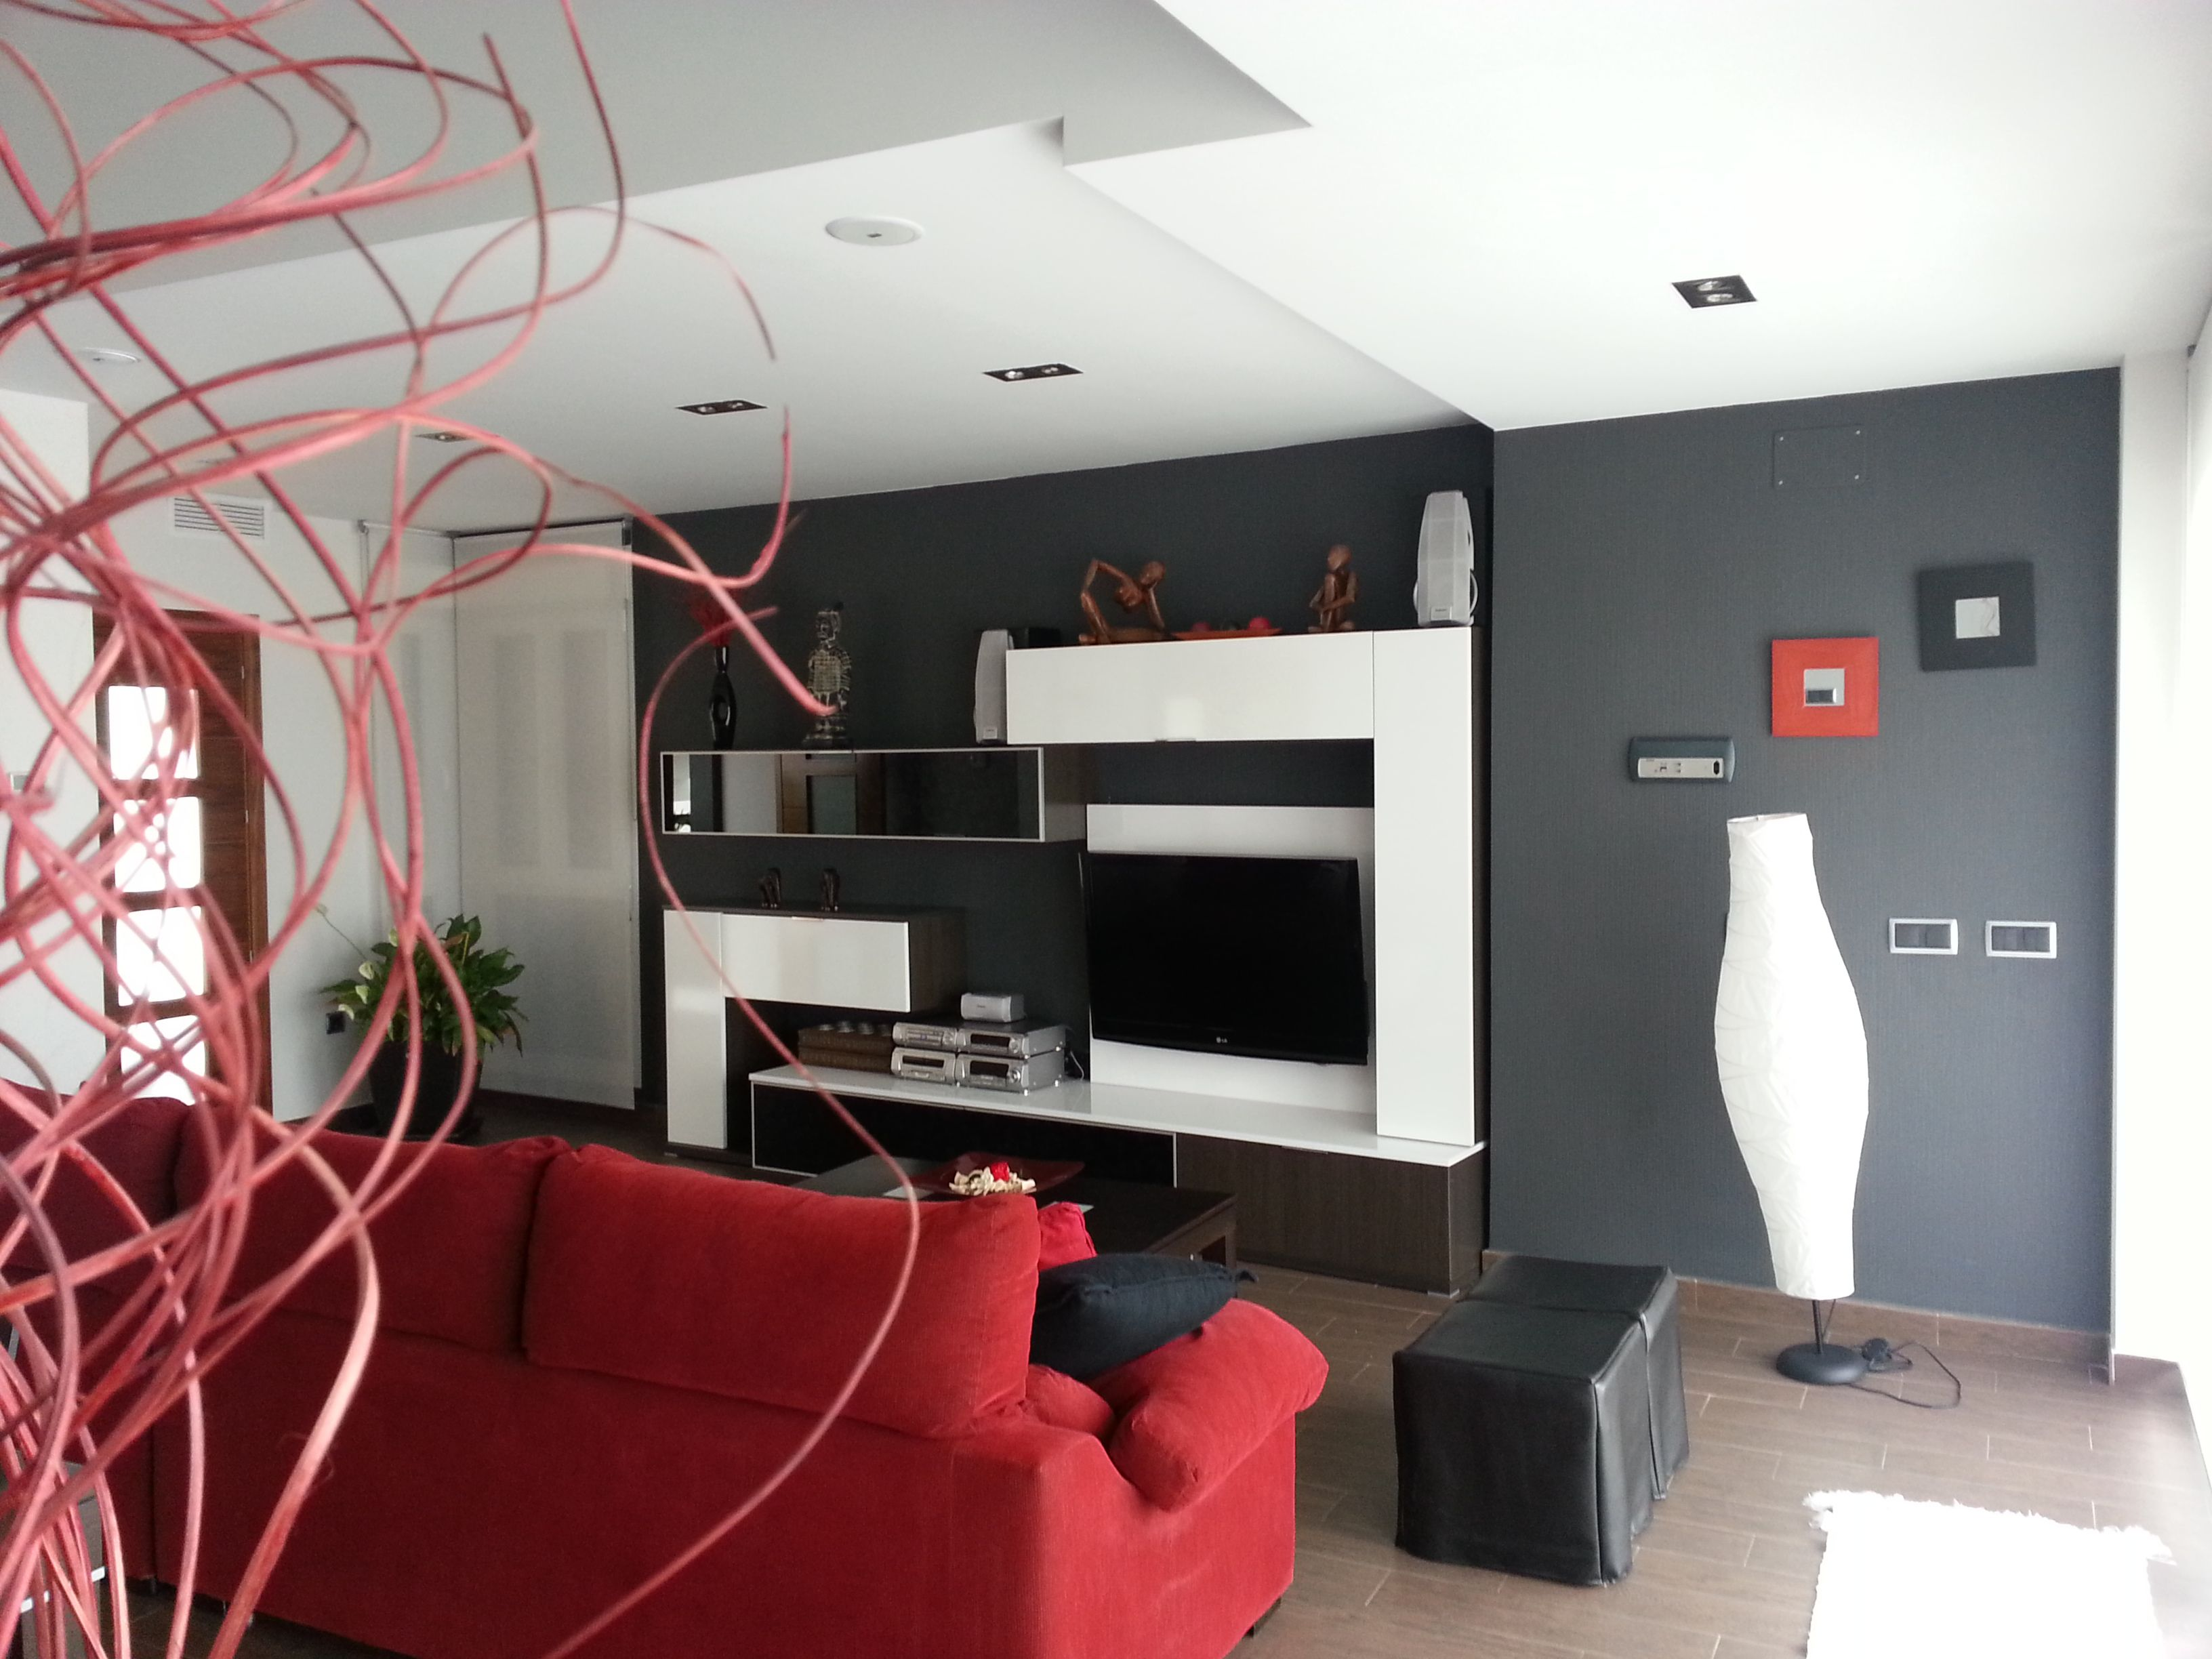 Sofas Modernos Para Sala De Tv Churchill Sofa Set Decoracion Moderno Estar Muebles